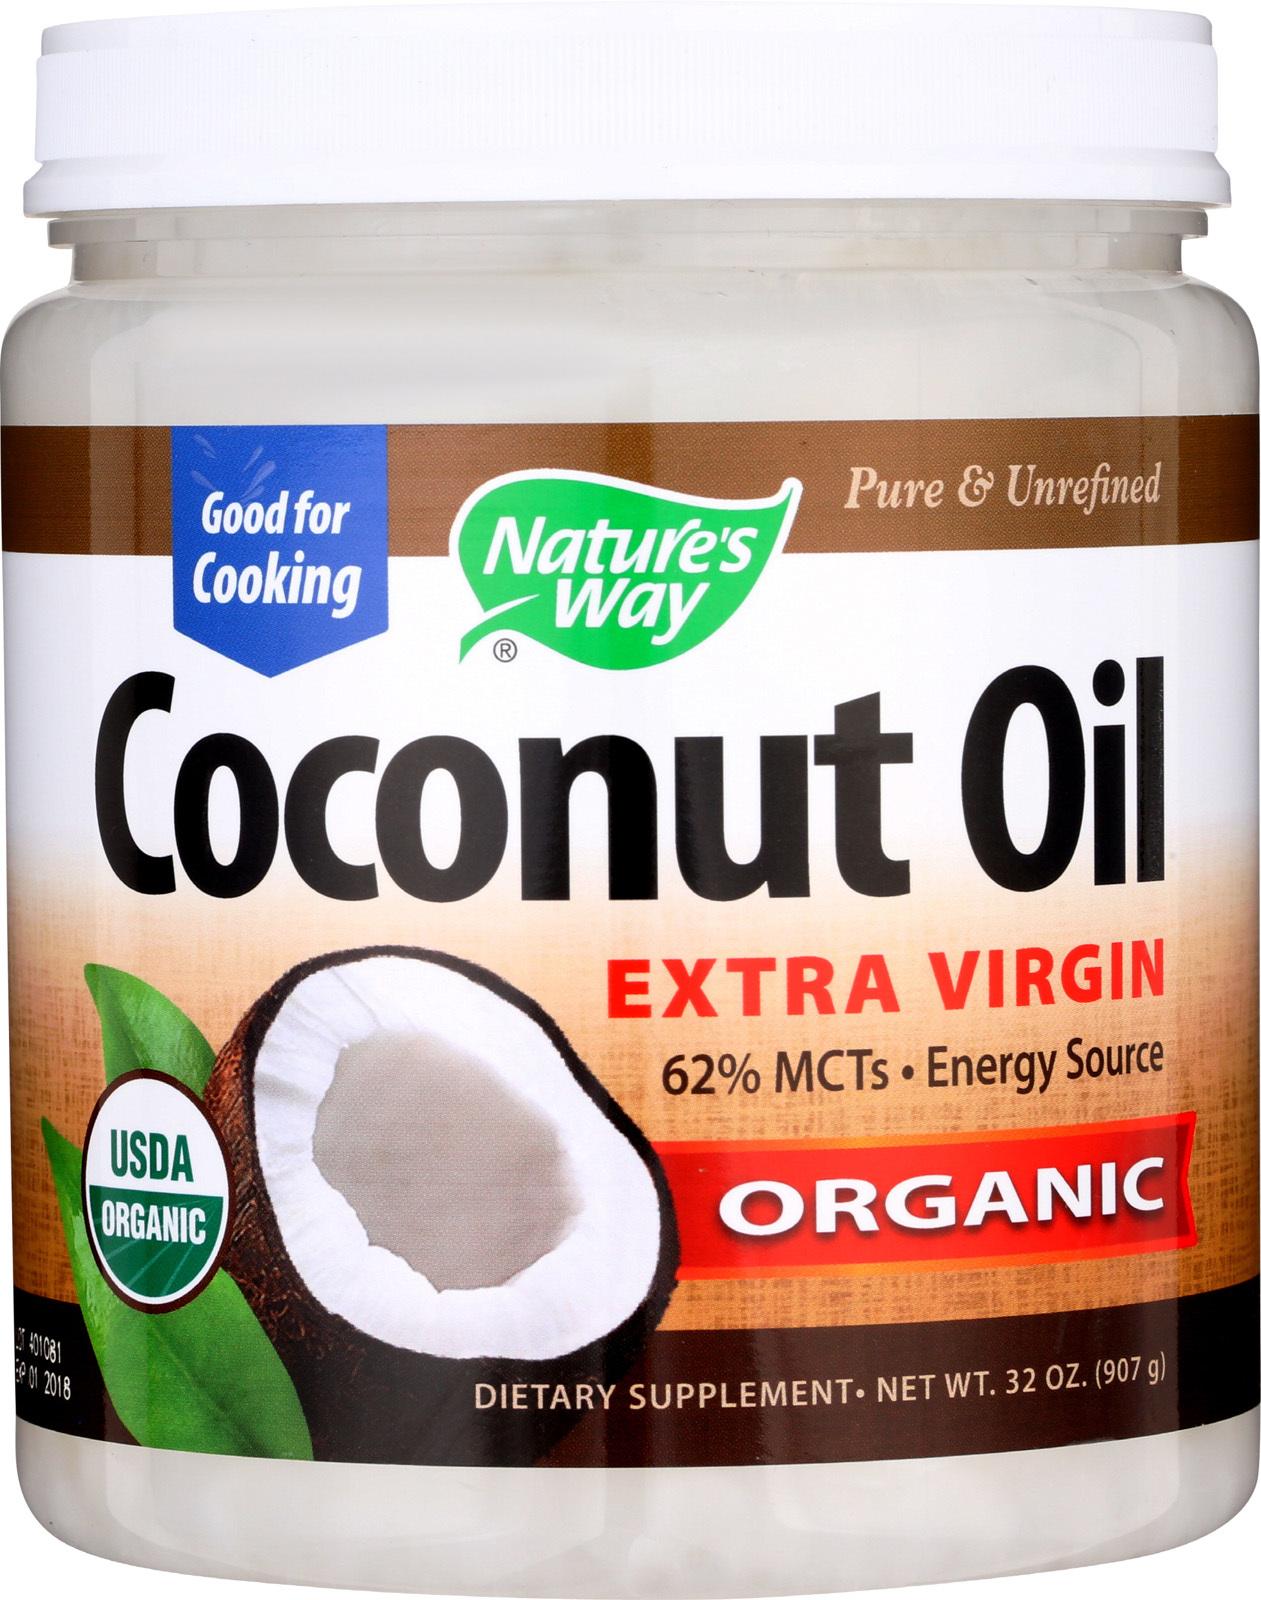 Nature's Way Coconut Oil - Extra Virgin - 32 oz.